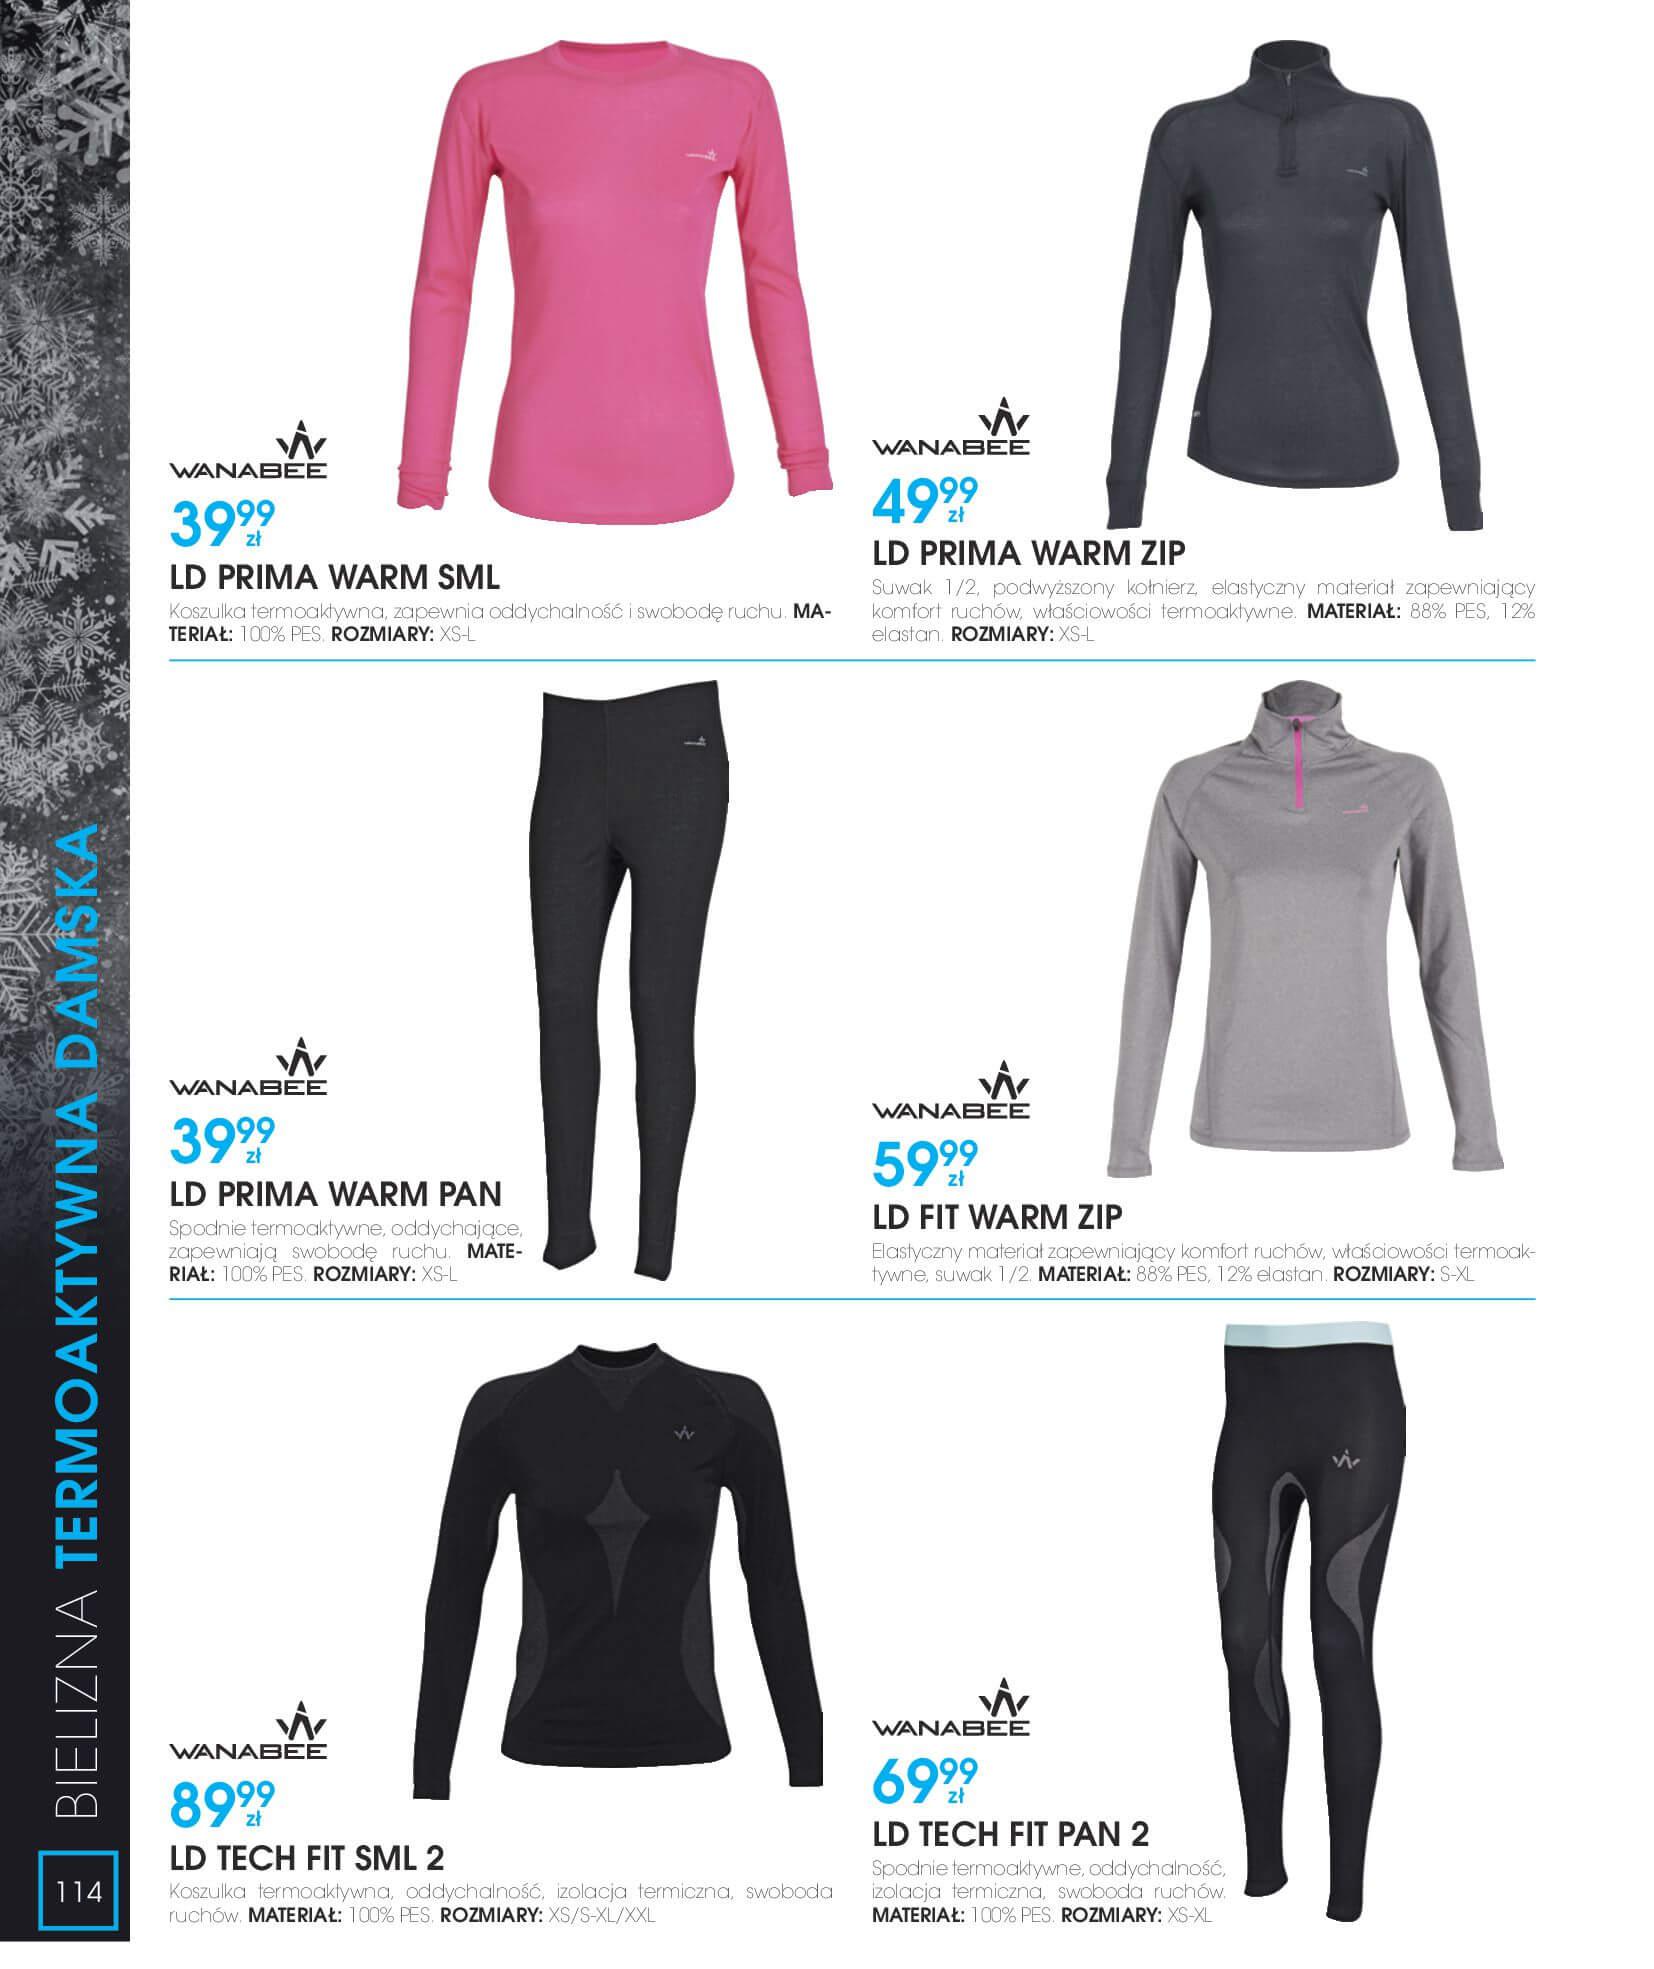 Gazetka Go Sport - Katalog Zima 2017/2018-12.11.2017-28.02.2018-page-114